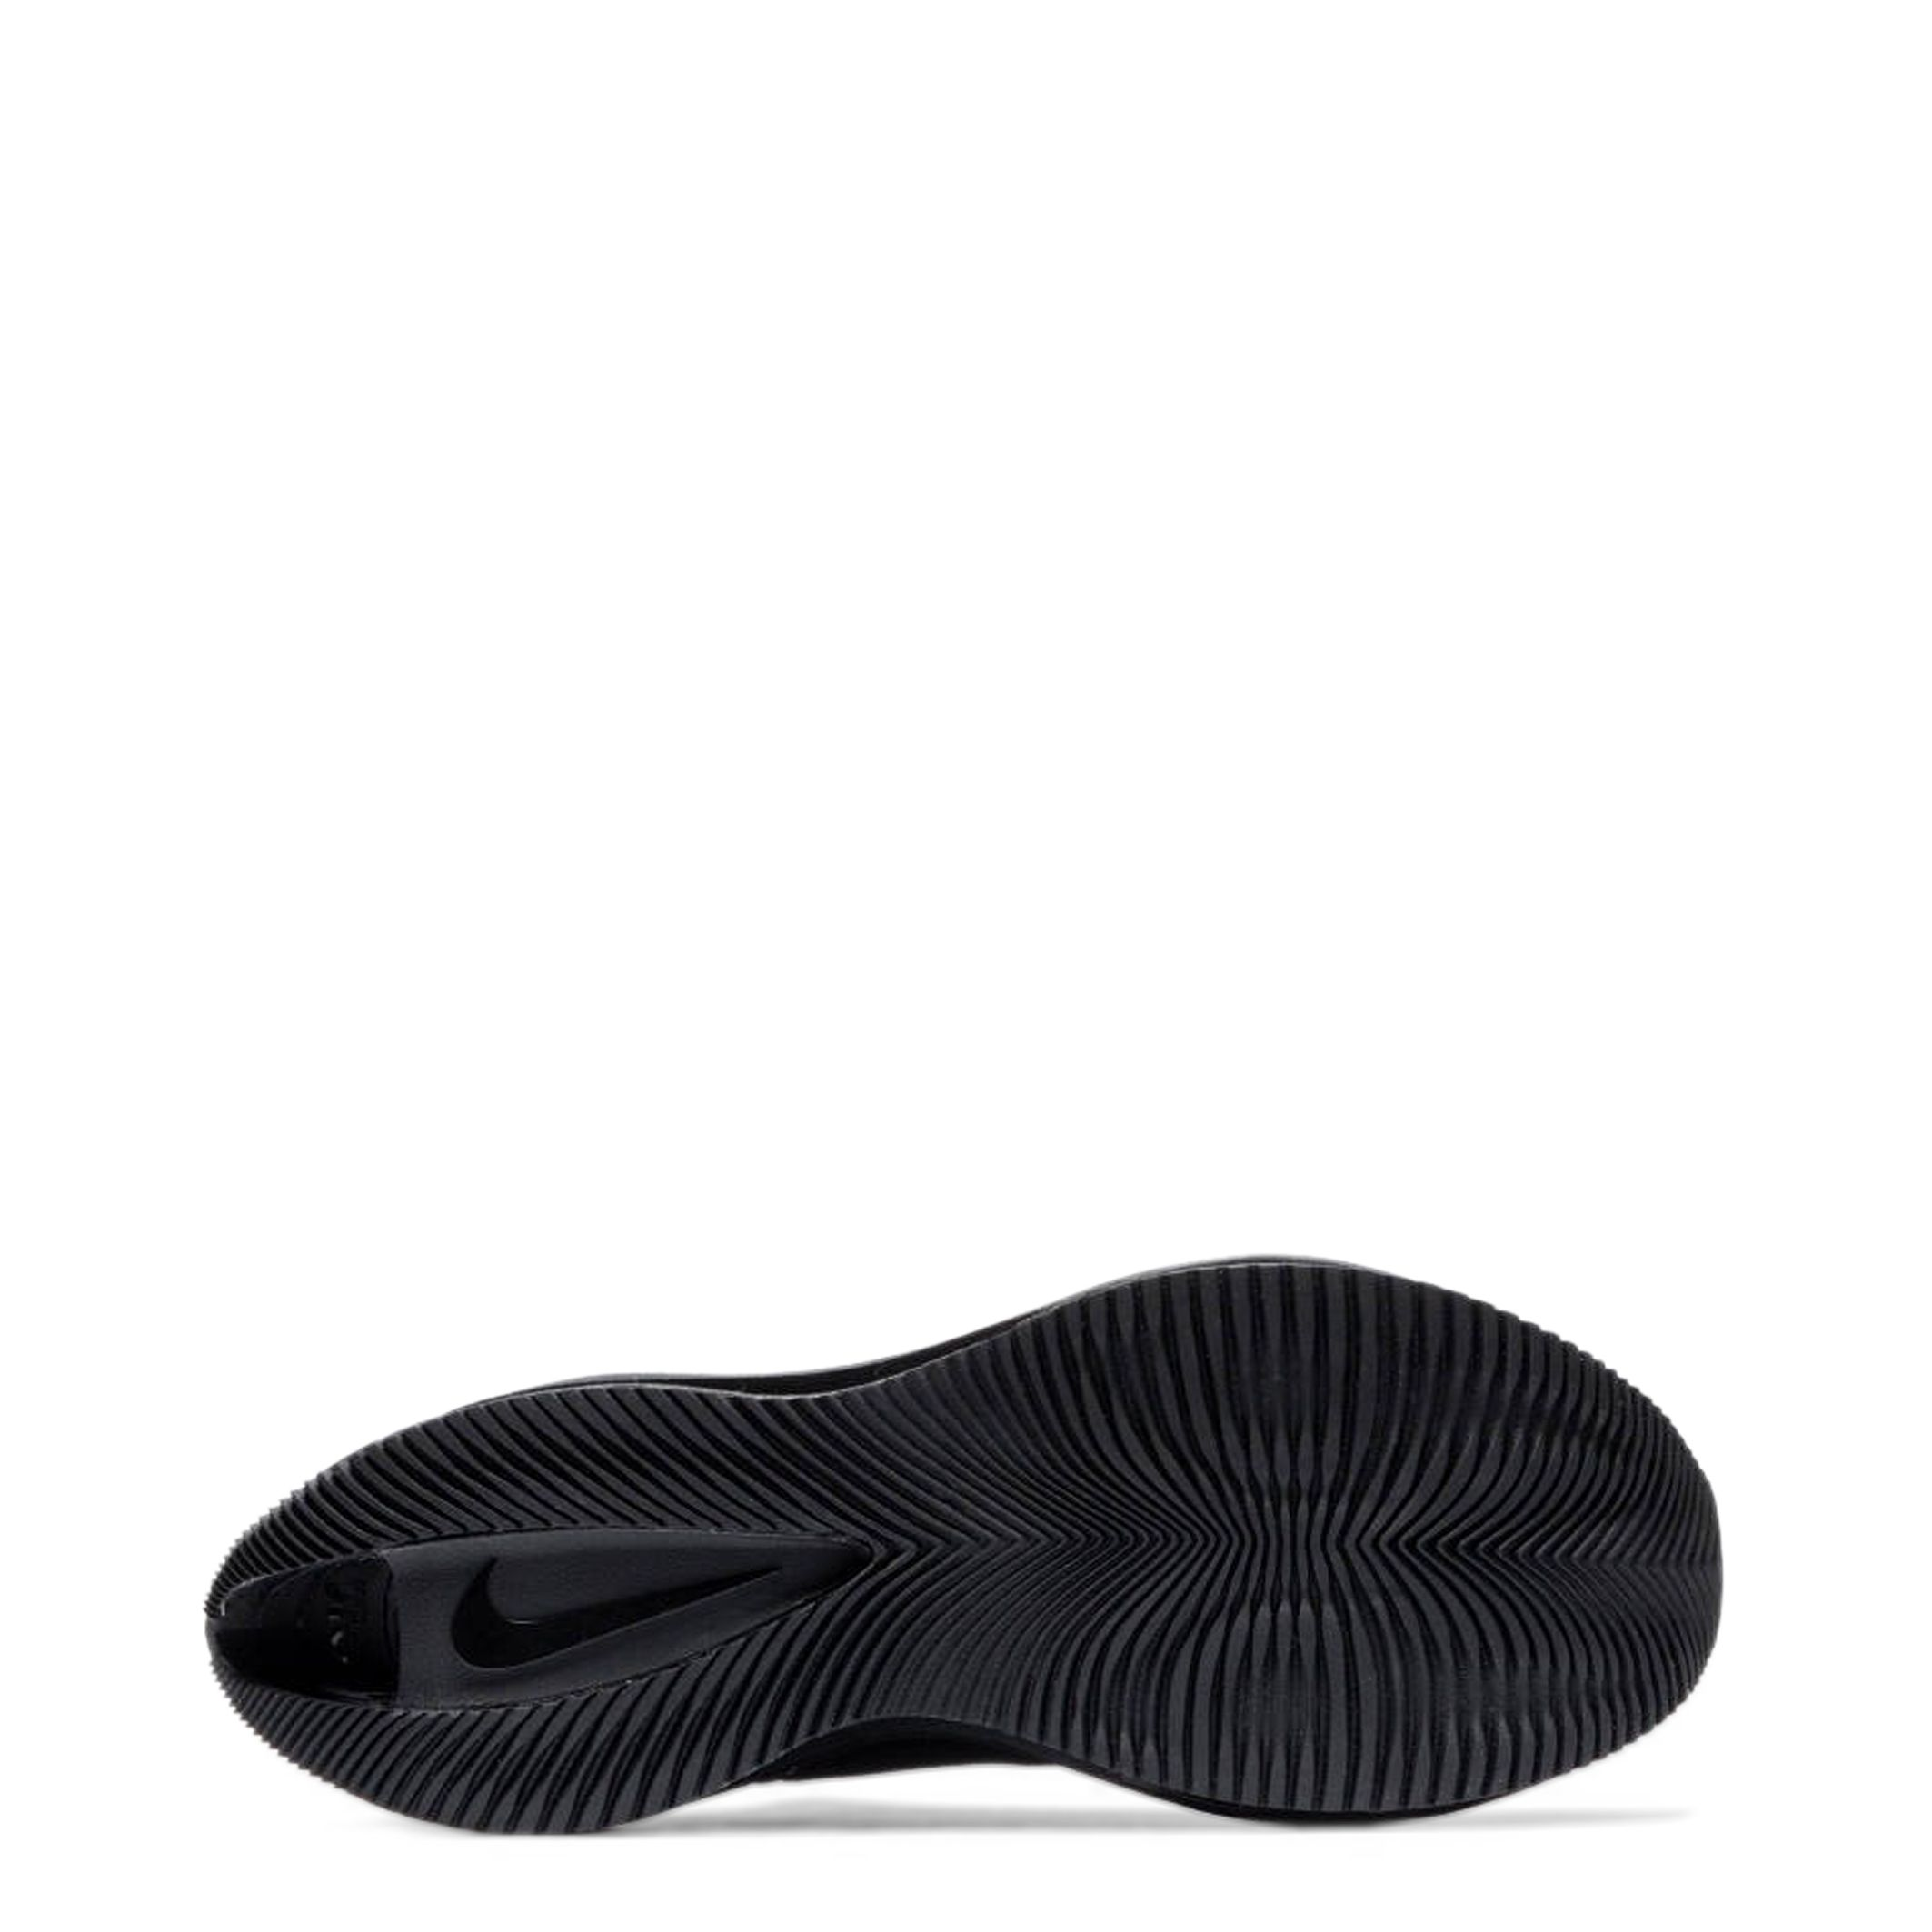 F6330820 6D21 11Eb 8C4F C5B33833D7F6 Nike - W-Zoomdoublestacked - Black